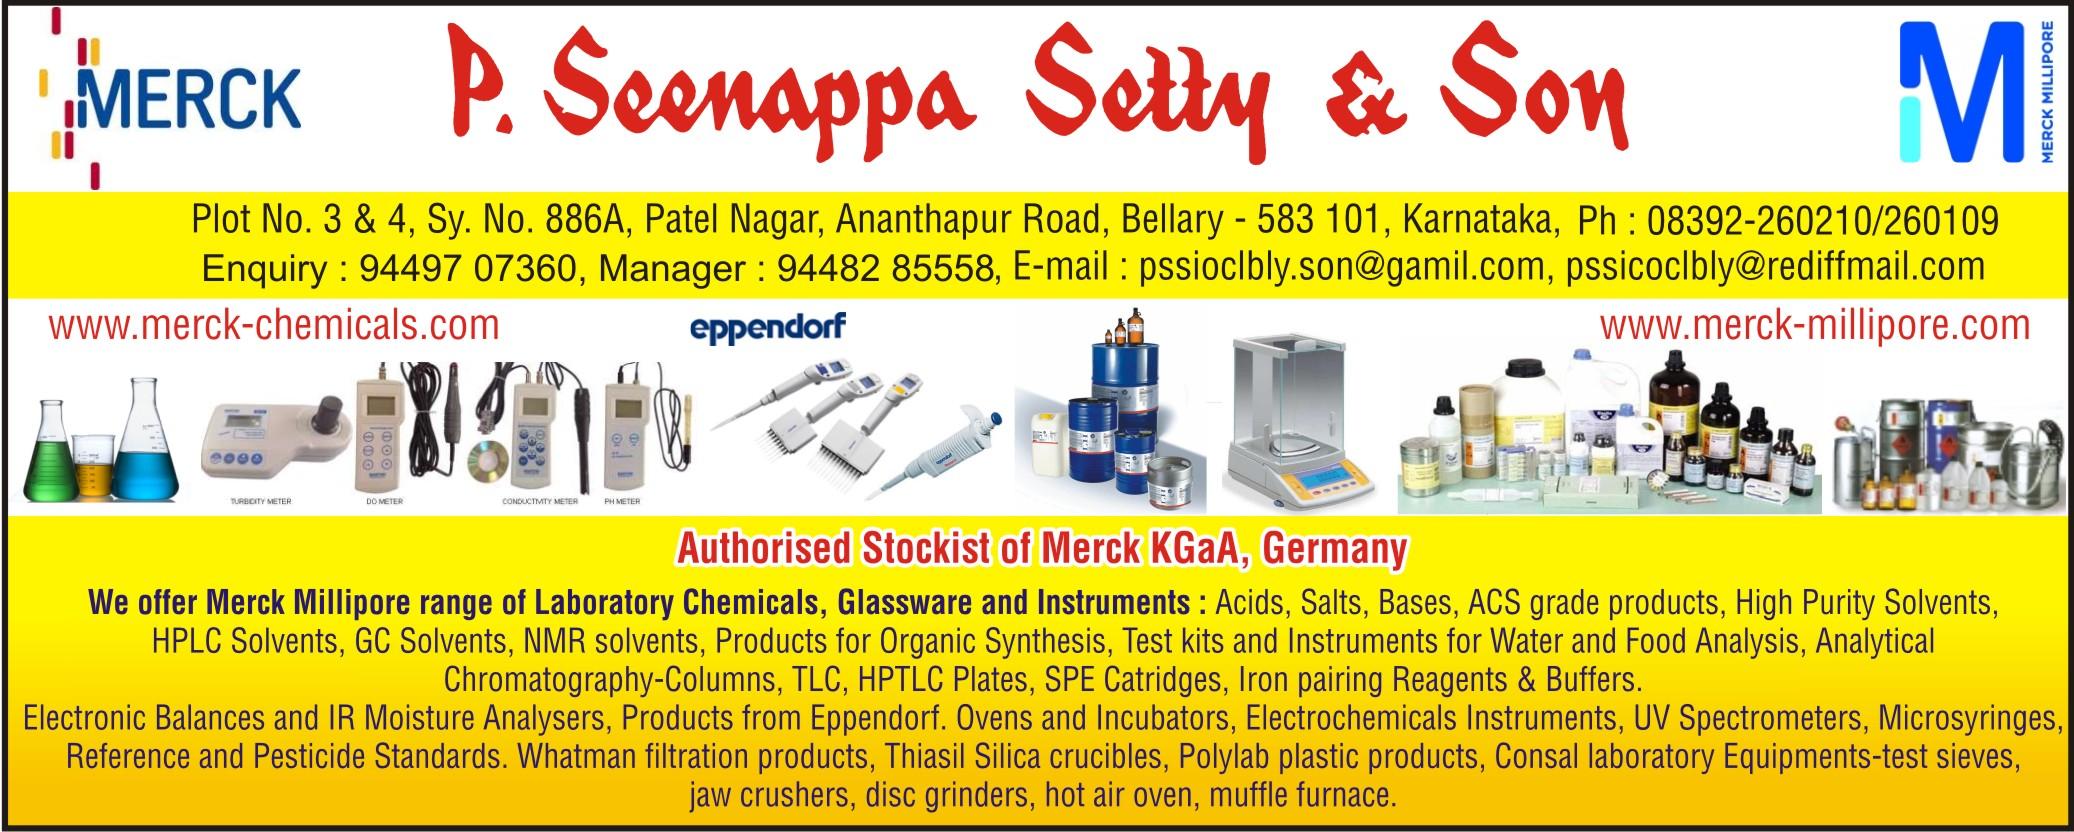 P. Seenappa Setty & Son